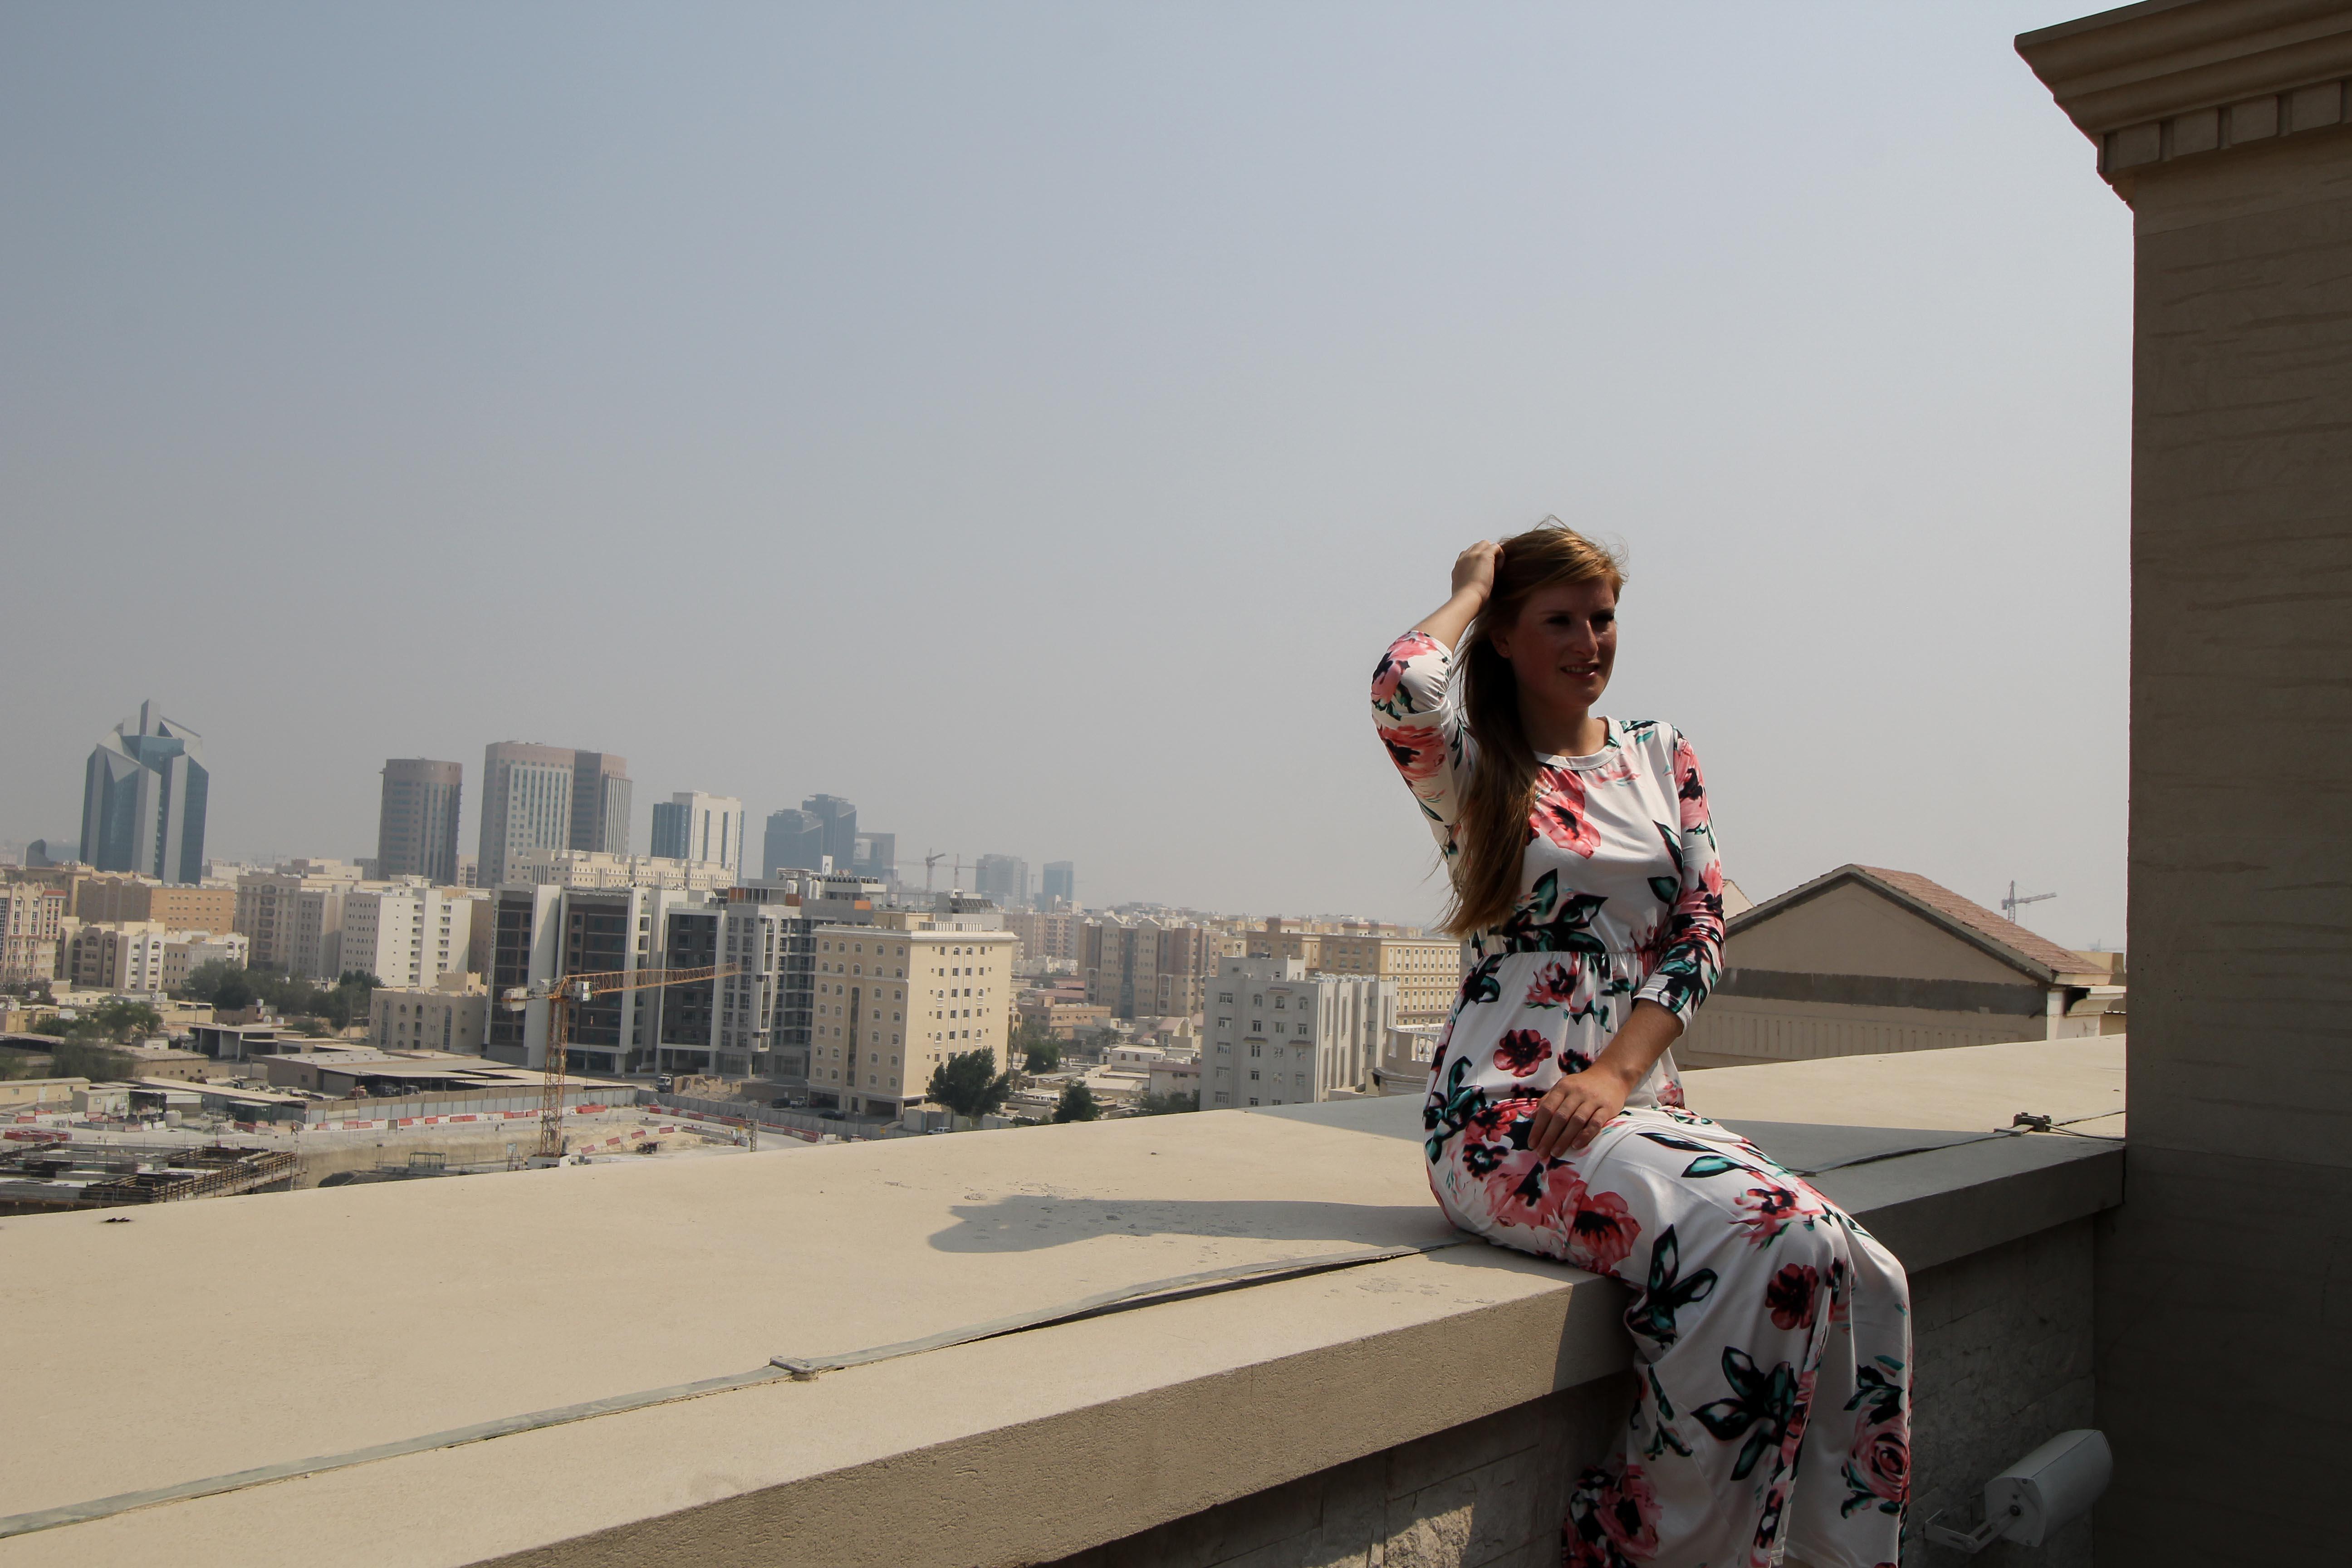 Warwick Hotel Doha Rooftop Skyline Doha Luxushotel 5 Sterne Hotel Qatar Reiseblog